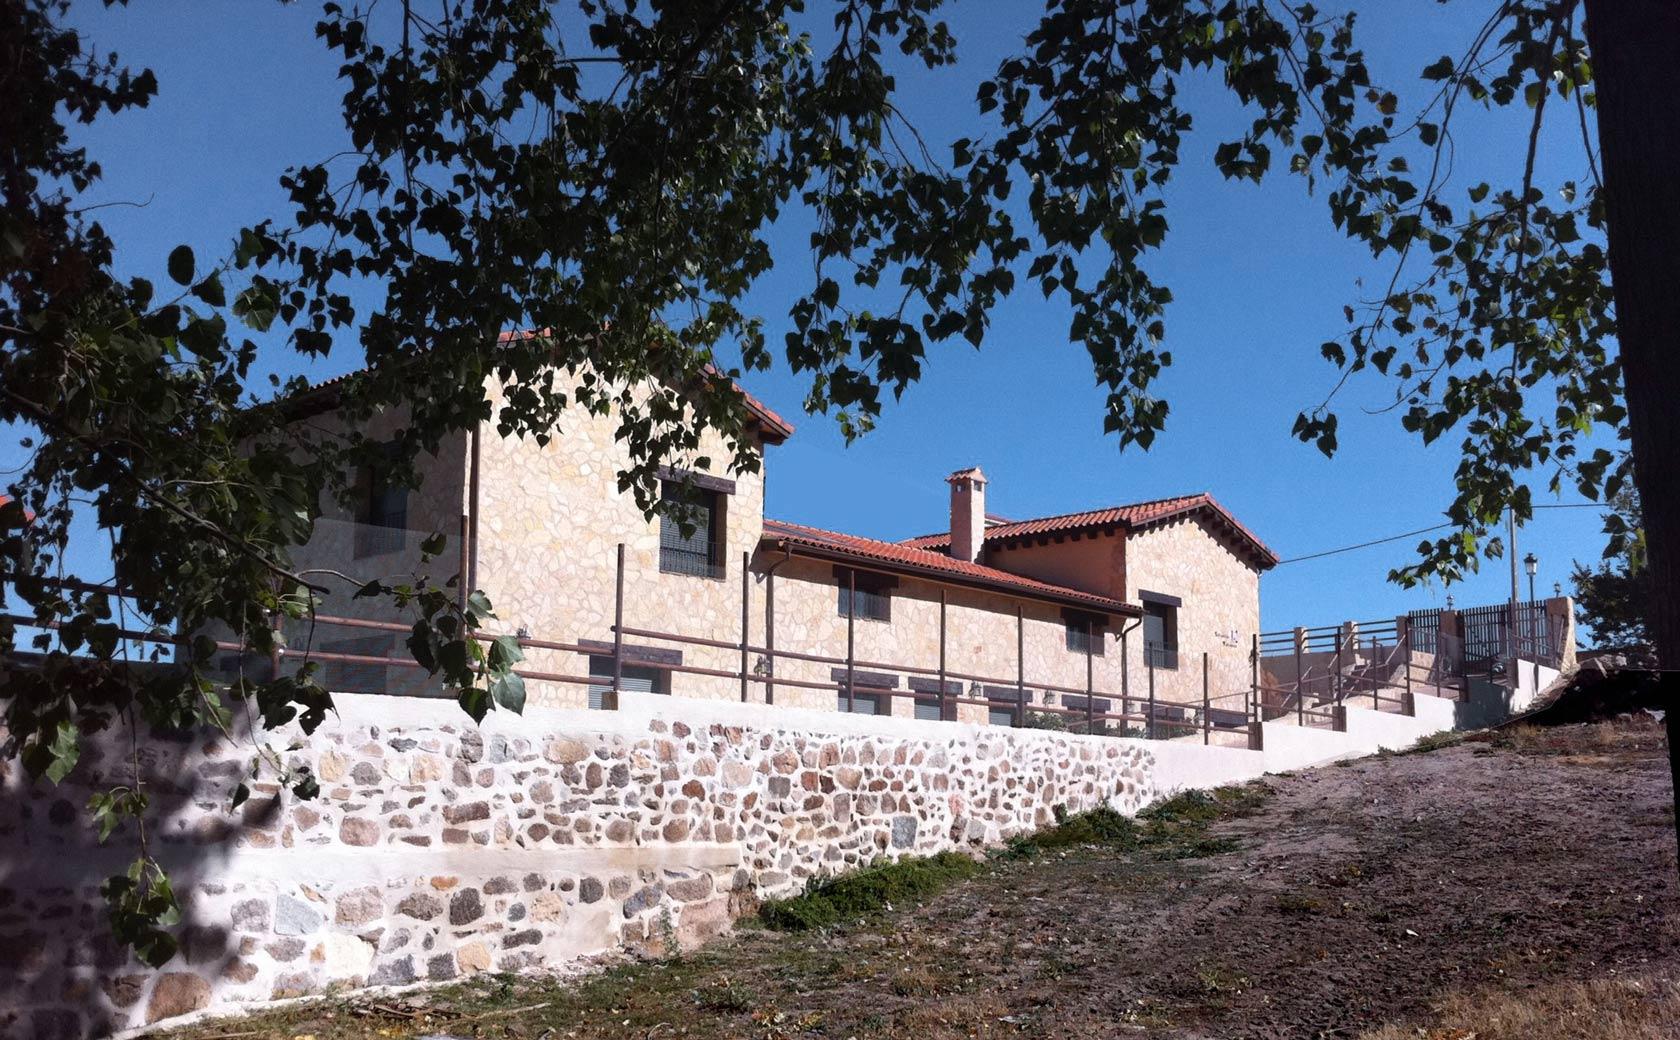 Casa Rural Zarzuela Bsr Architecture Engineering ~ Rehabilitacion De Casas Rurales